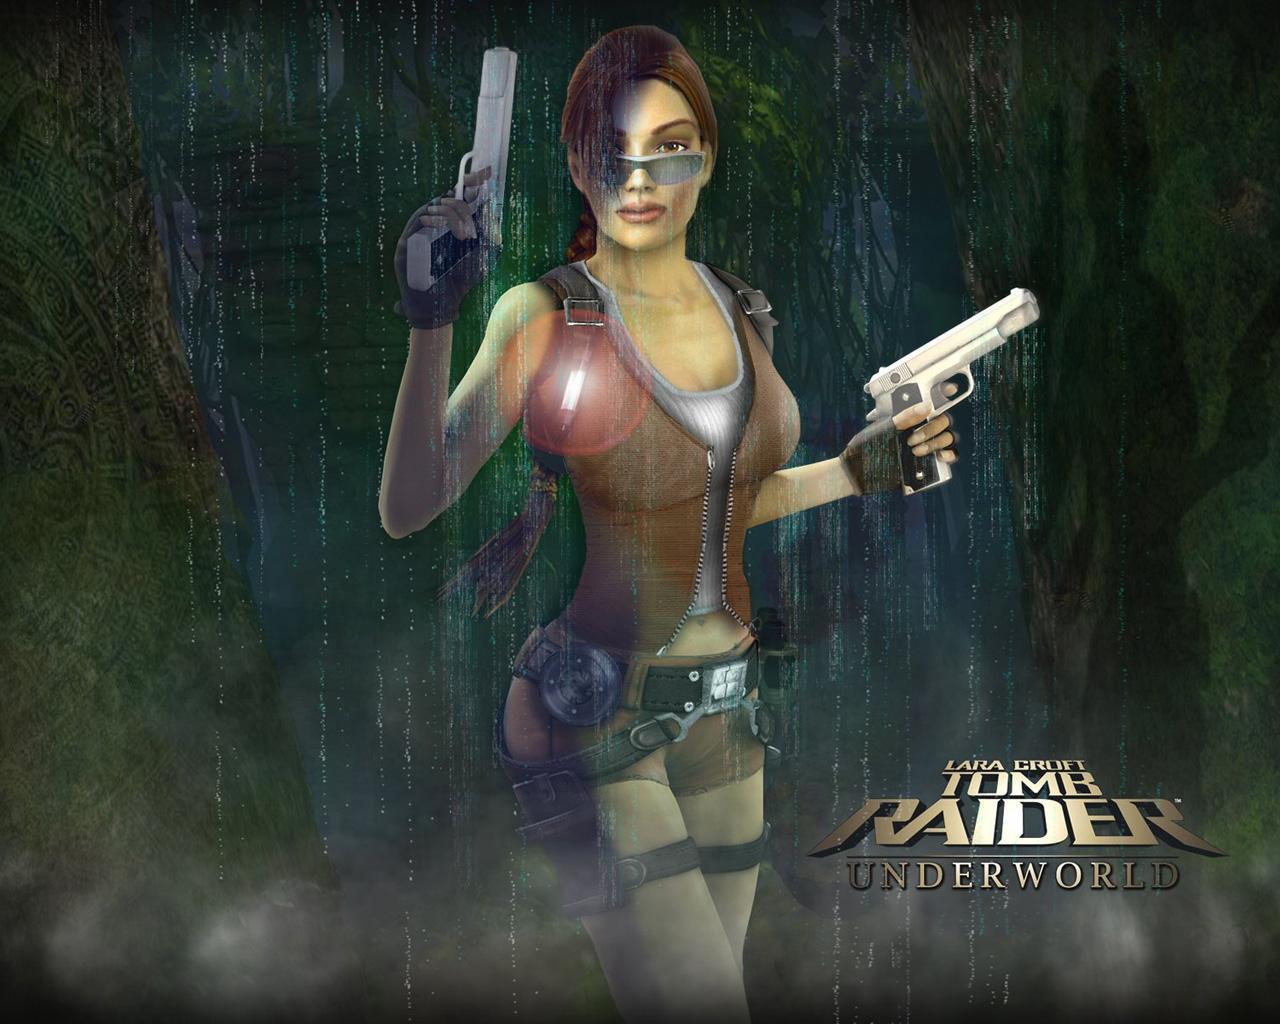 Lara croft nude cheat code hentai pictures